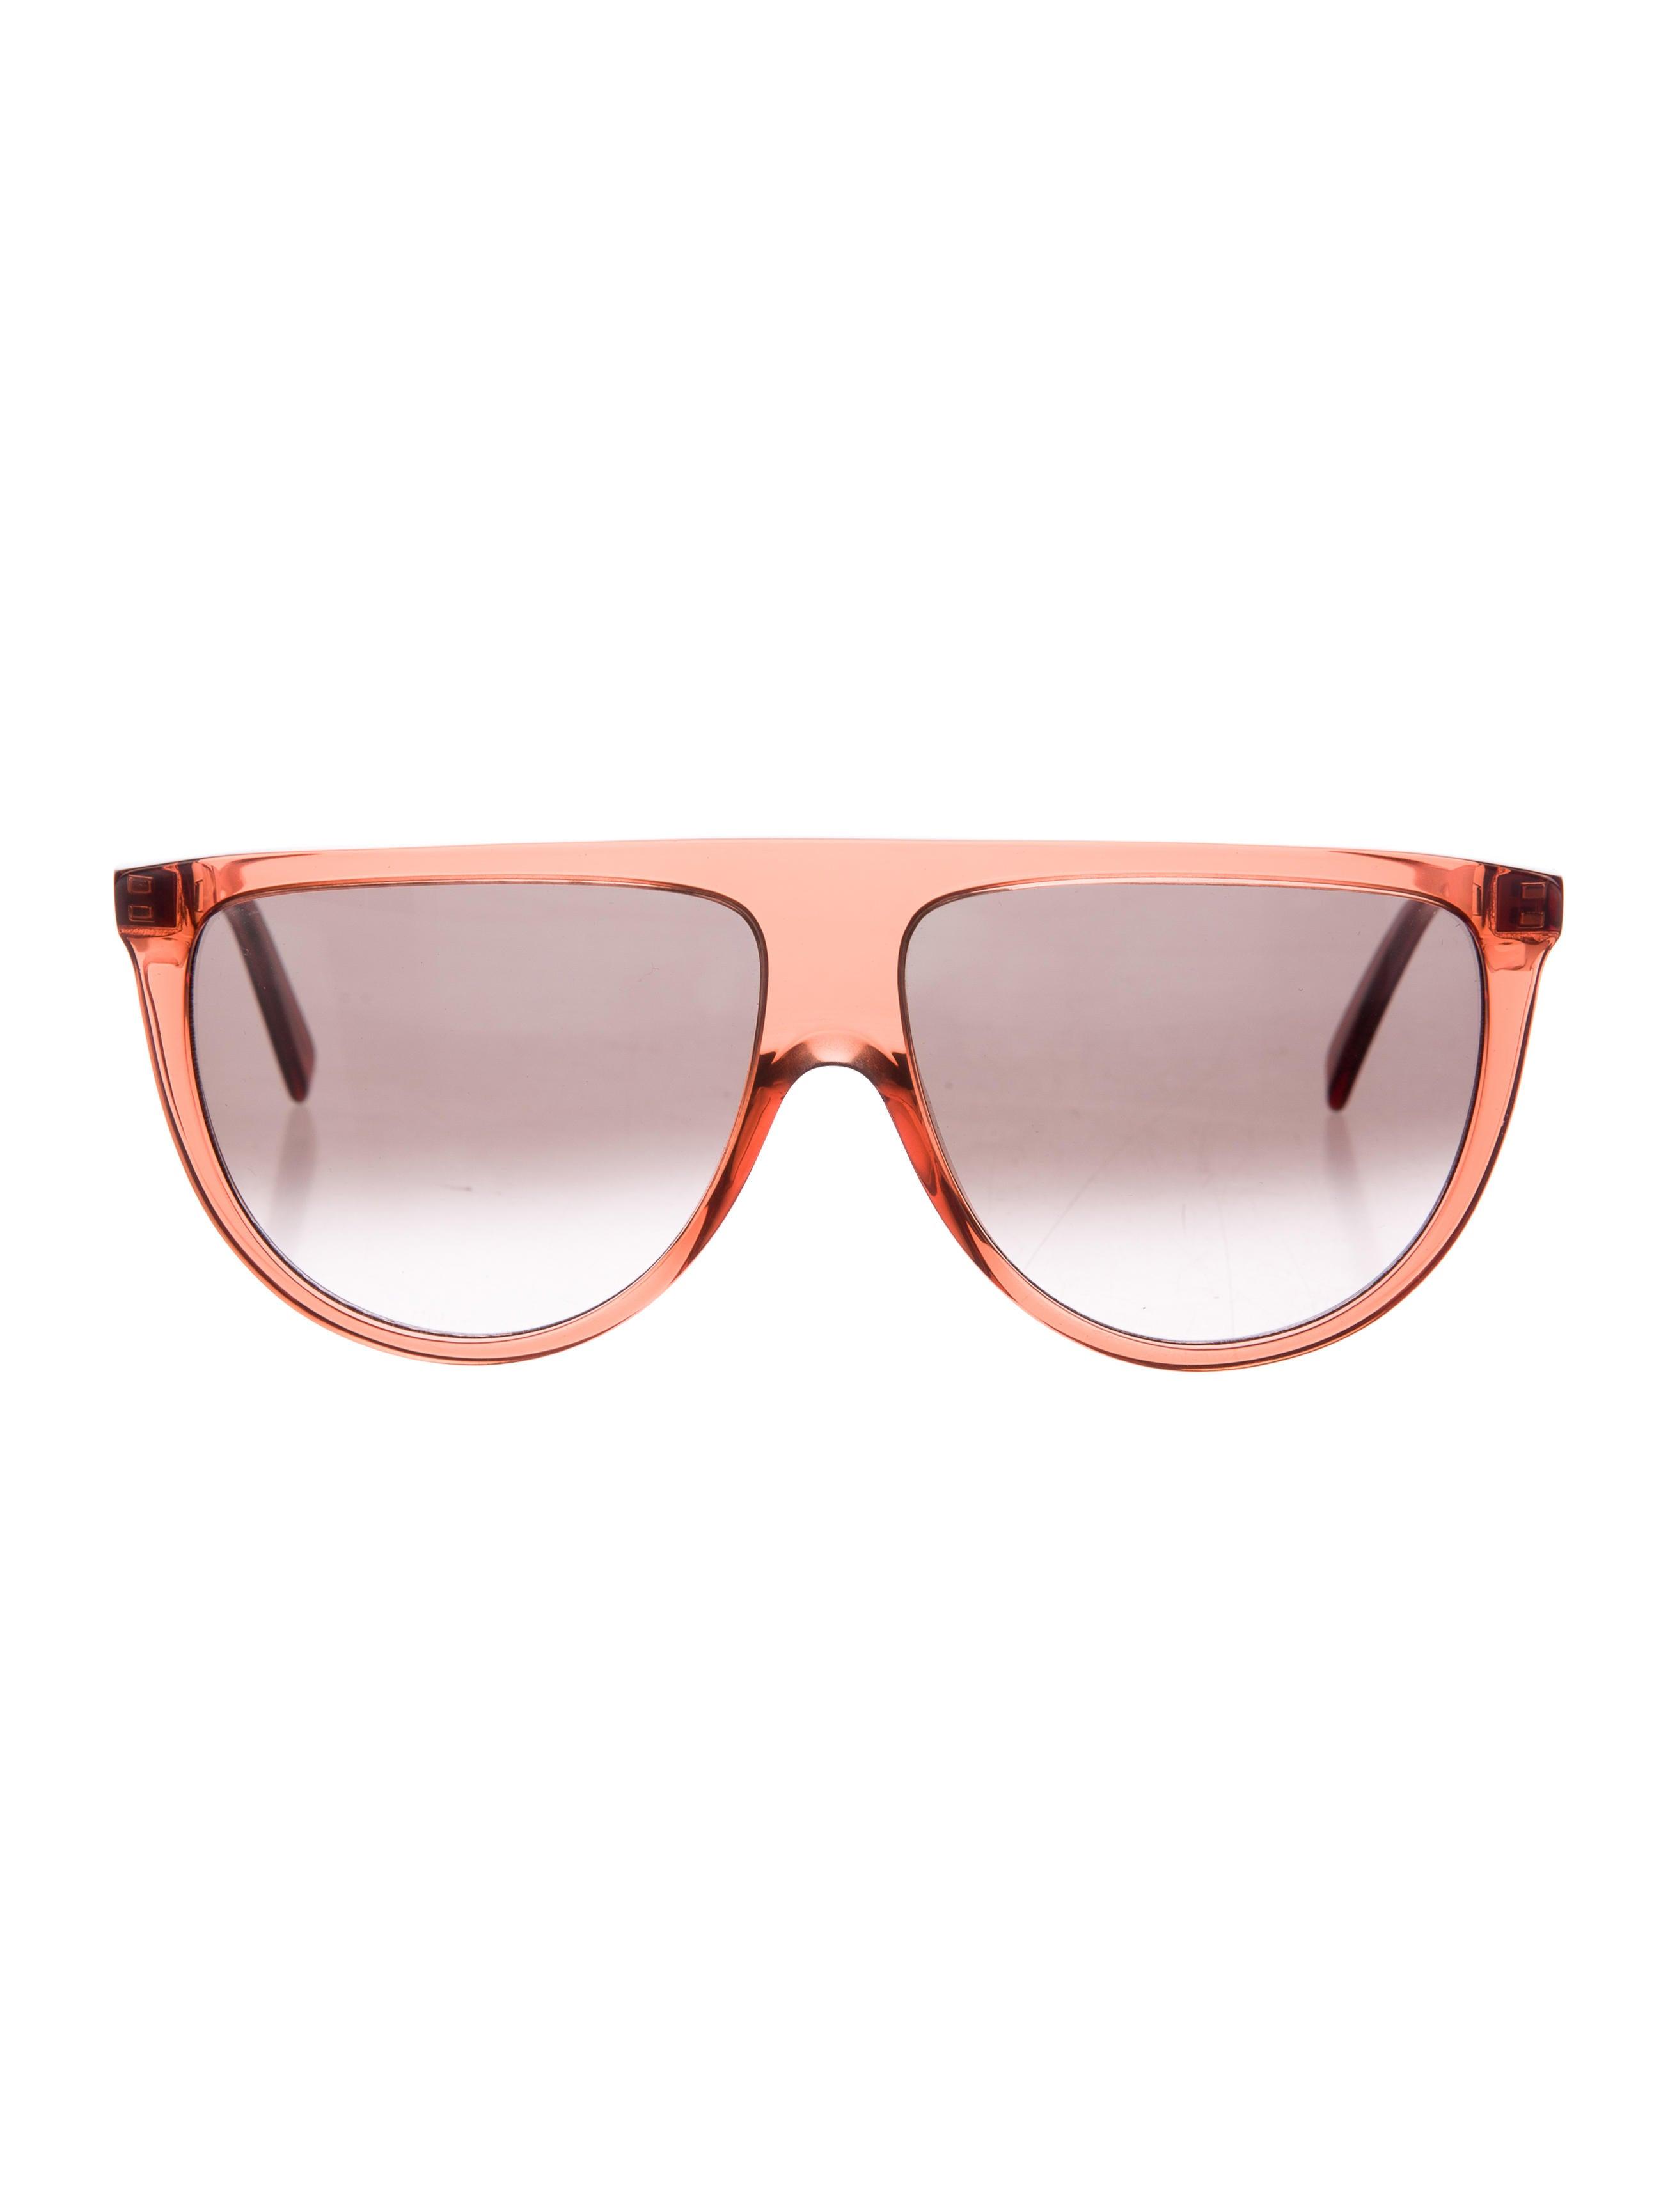 b8855e7be754 Celine Thin Shadow Sunglasses Replica